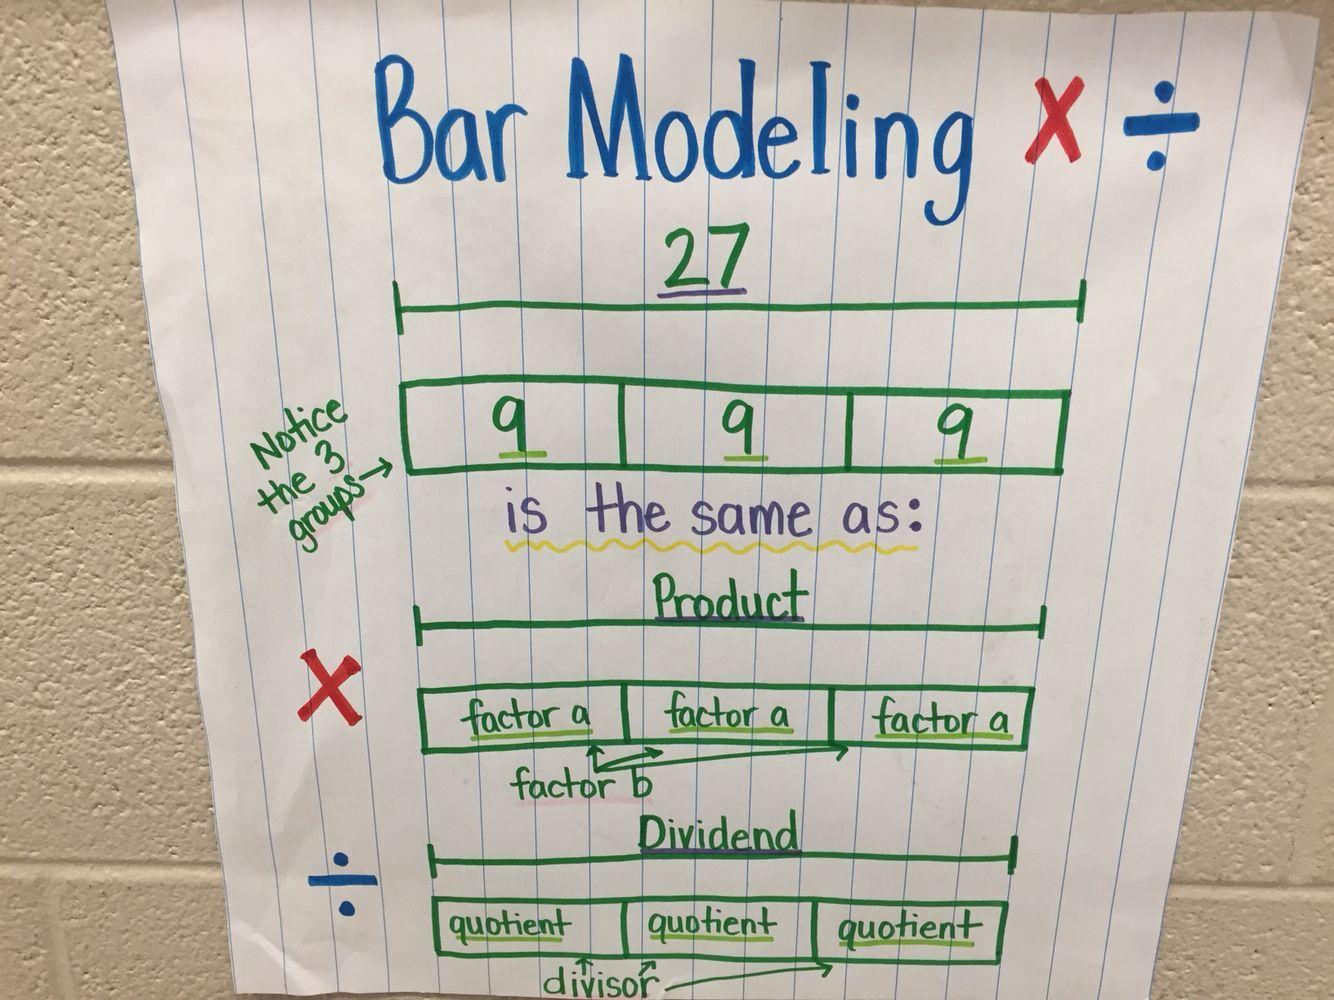 Bar Modeling Multiplication And Division Singapore Math Bar Model Math Notebooks Awesome Bar Modeling Multiplication Bar Model Third Grade Math Math Charts Bar model multiplication worksheets